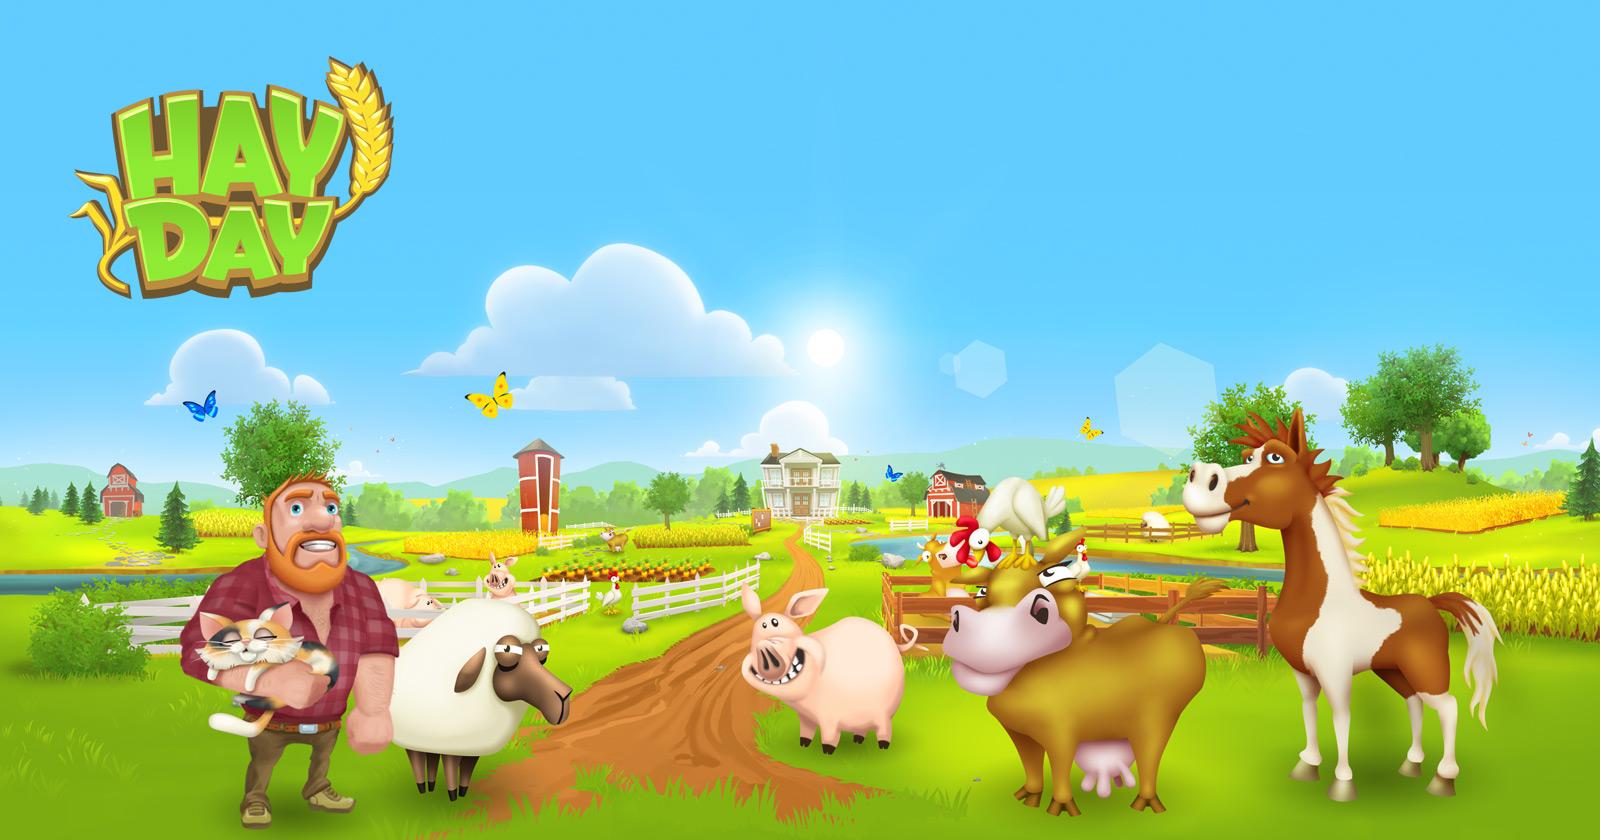 لعبة هاي داي تنزيل سريع – Hay Day